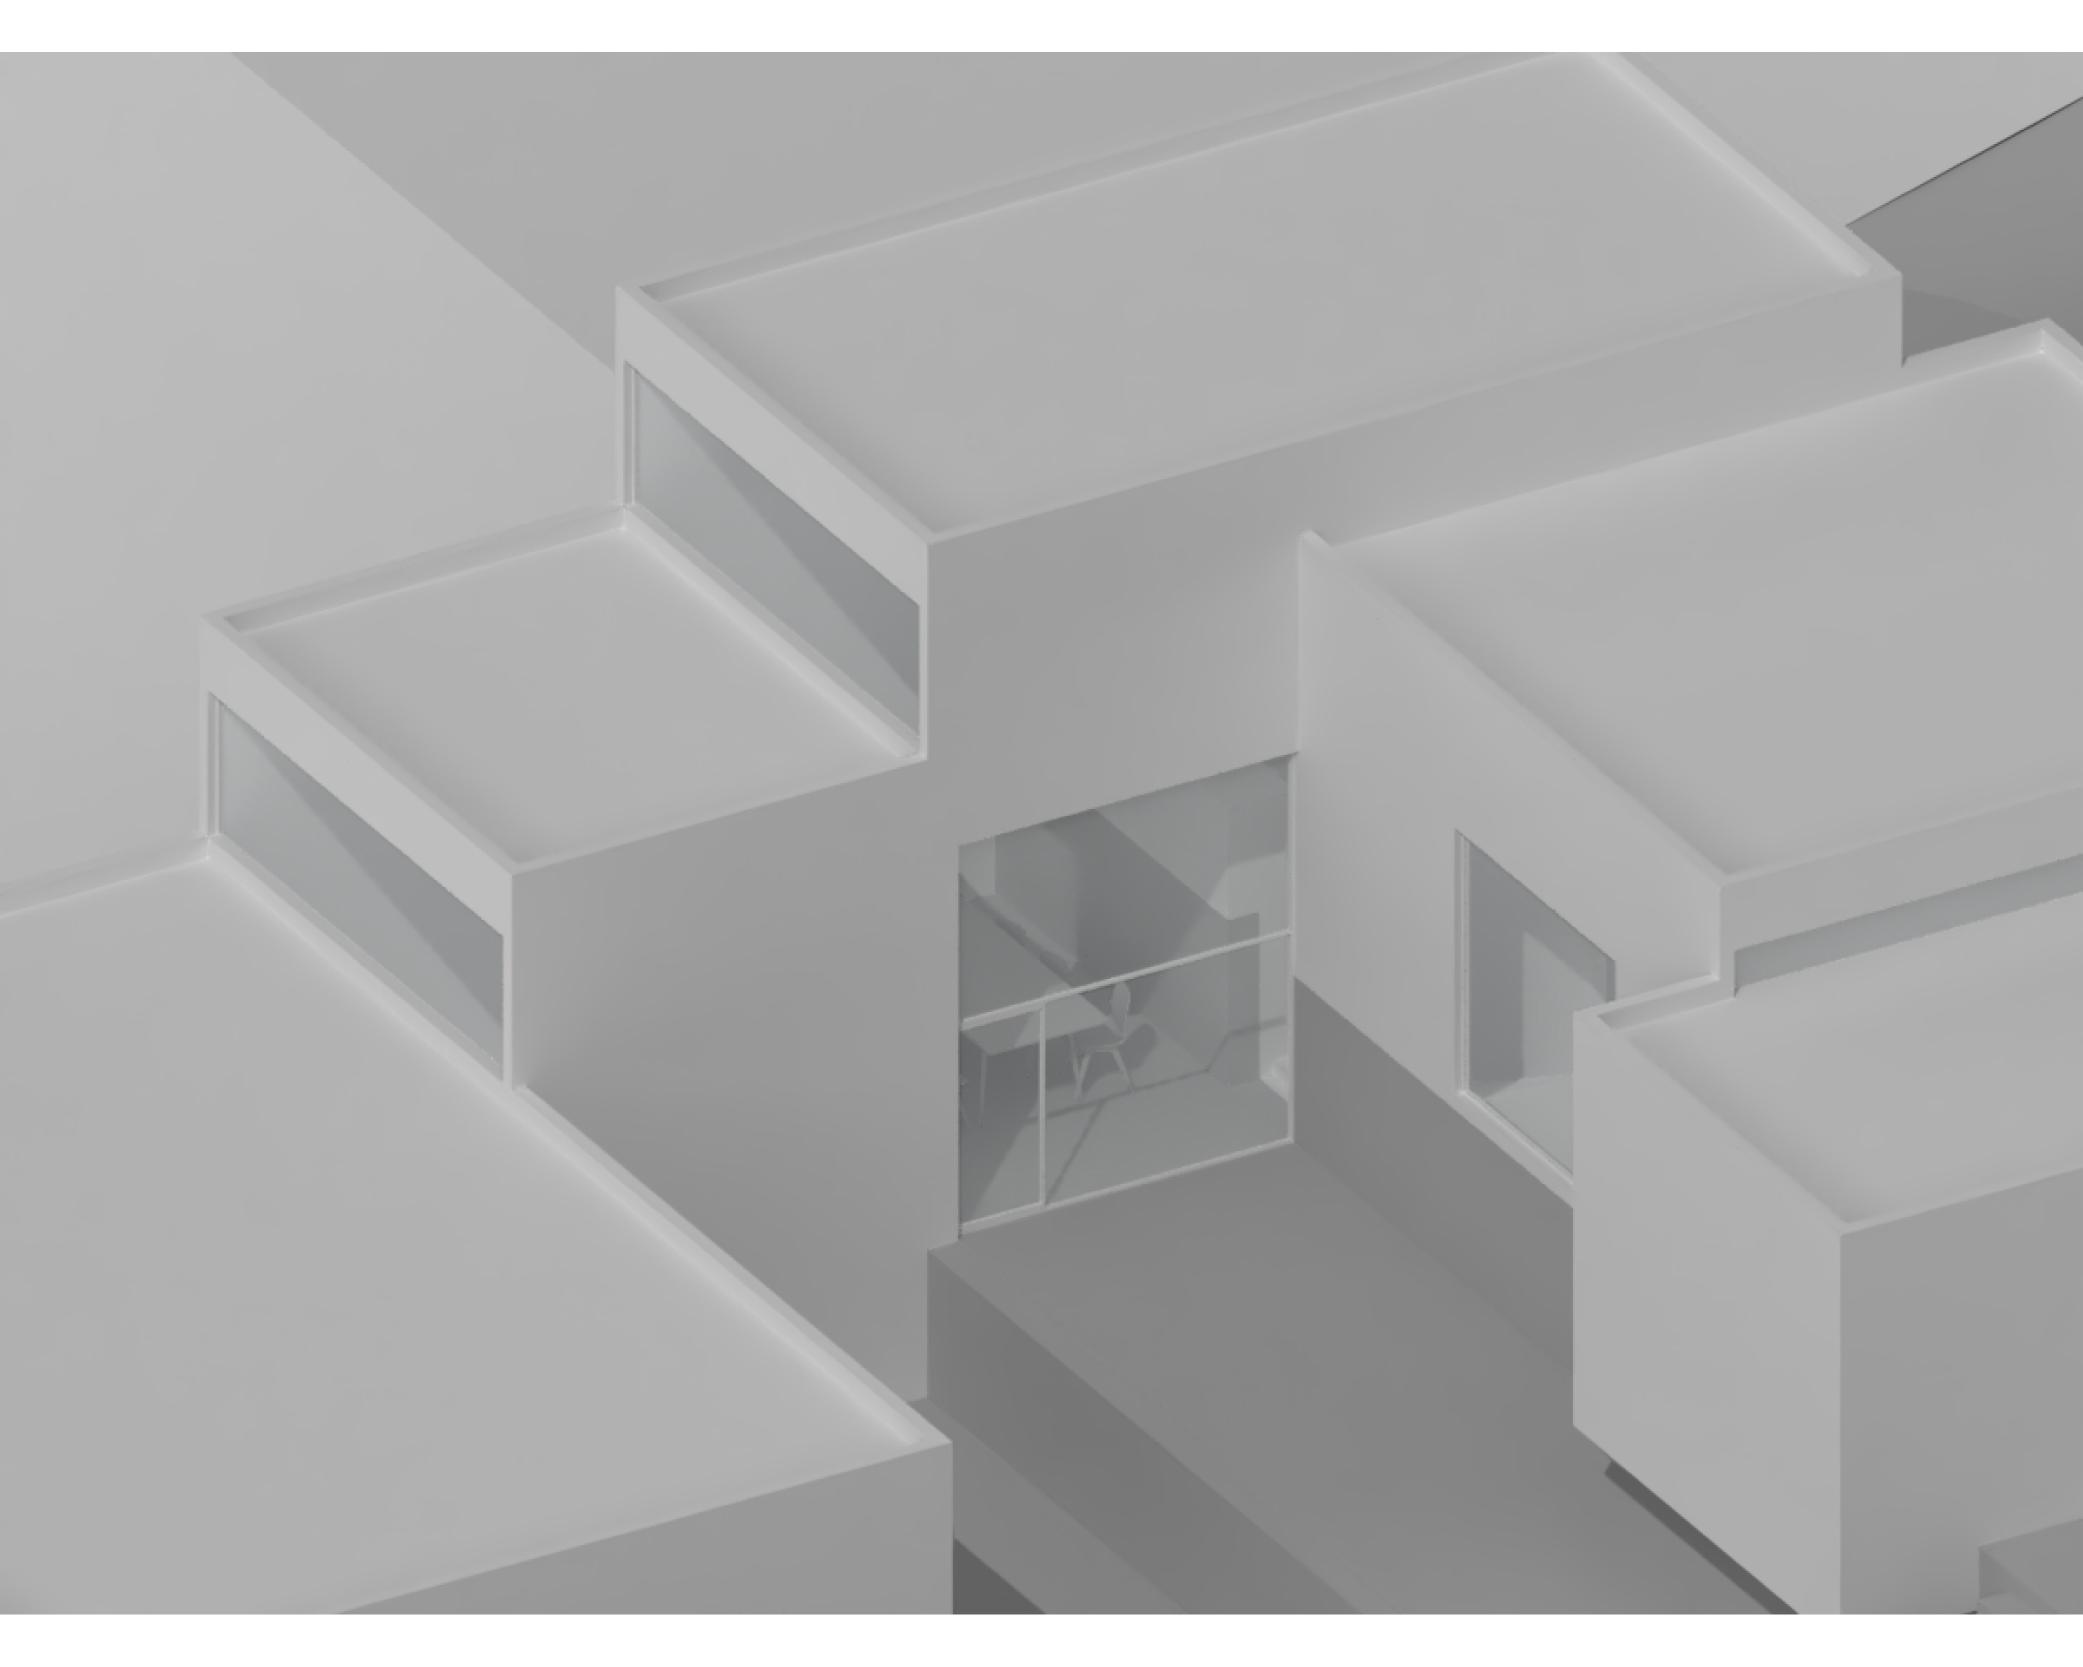 Square Template for Slideshows-13.jpg